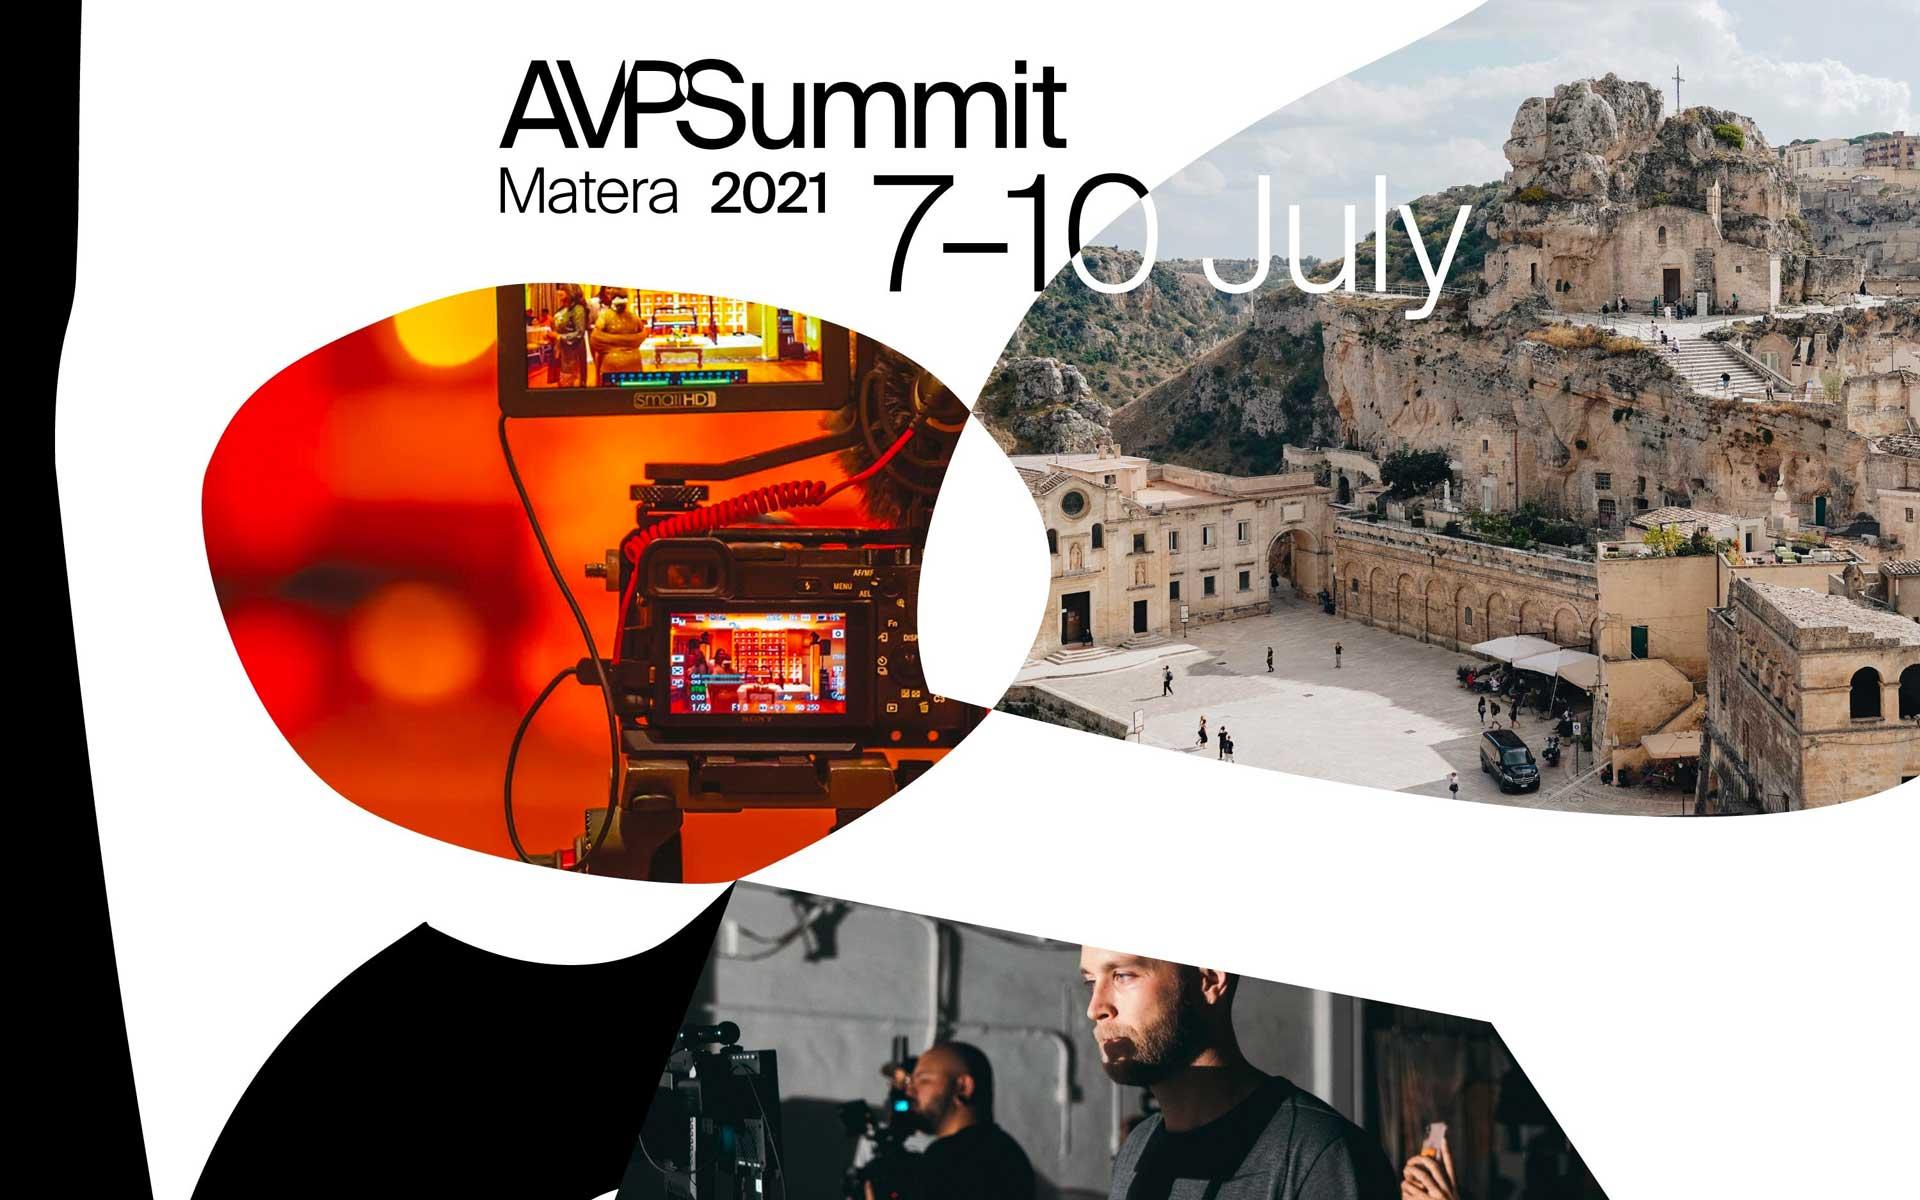 avp-summit-matera-2021-eng-lucana-film-commission-promozione-film-fiction-spot-pubblicitari-documentari-basilicata